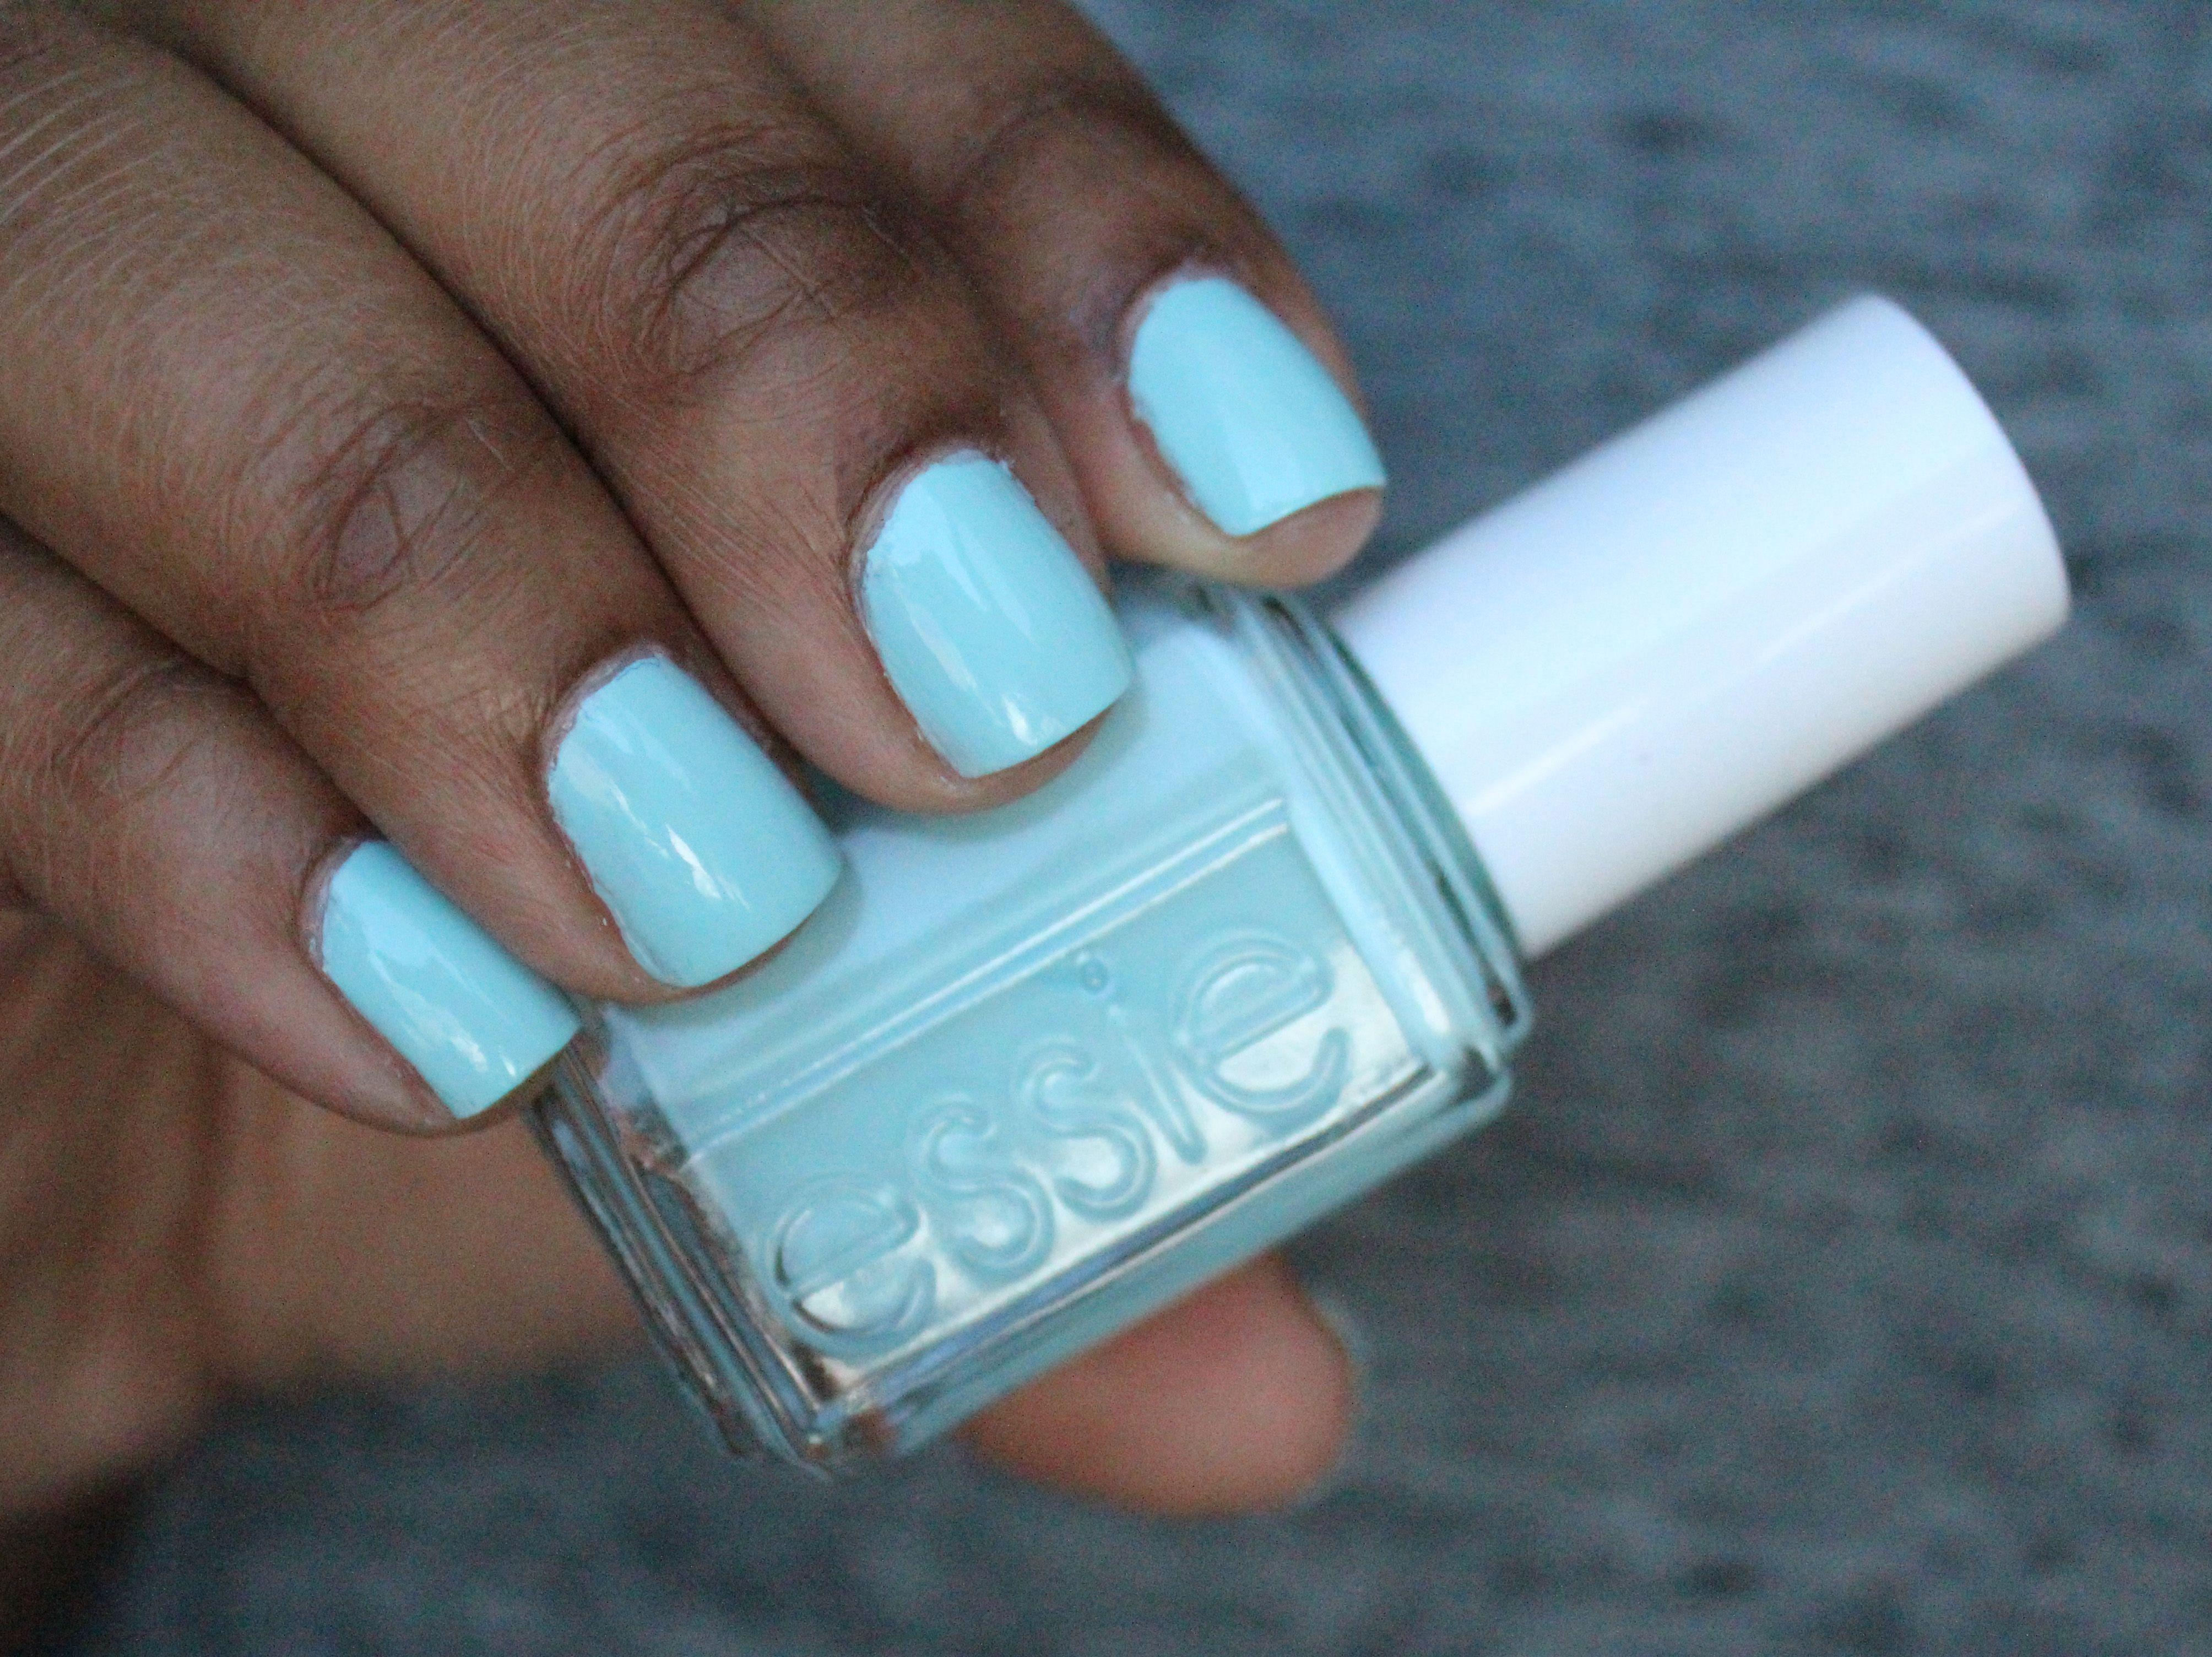 mint candy apple essie dark skin - Google Search | Favorite Nail ...